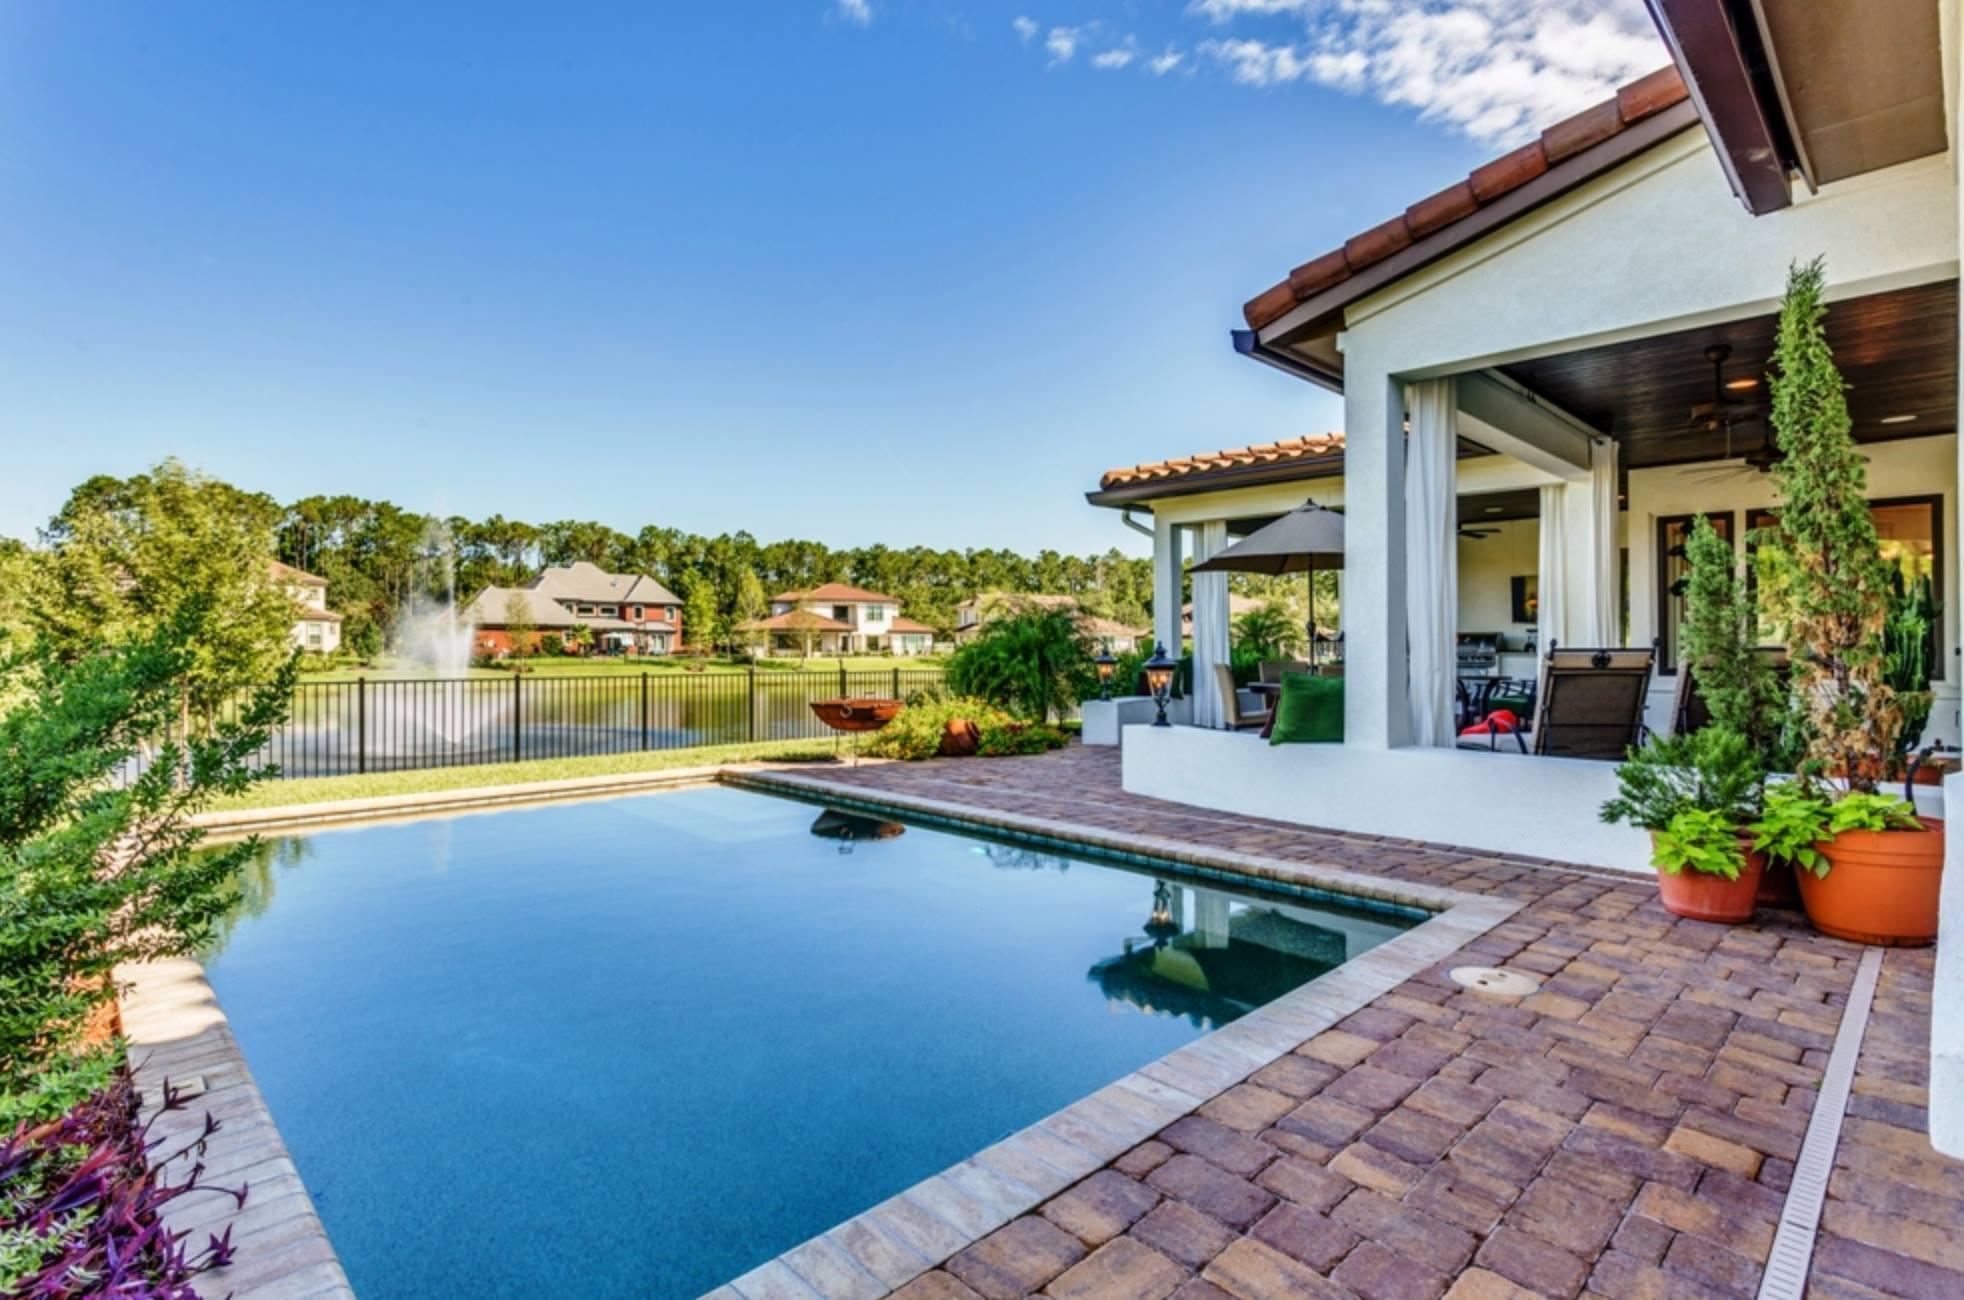 Pool Homes For Sale Jacksonville Fl Inground Pools